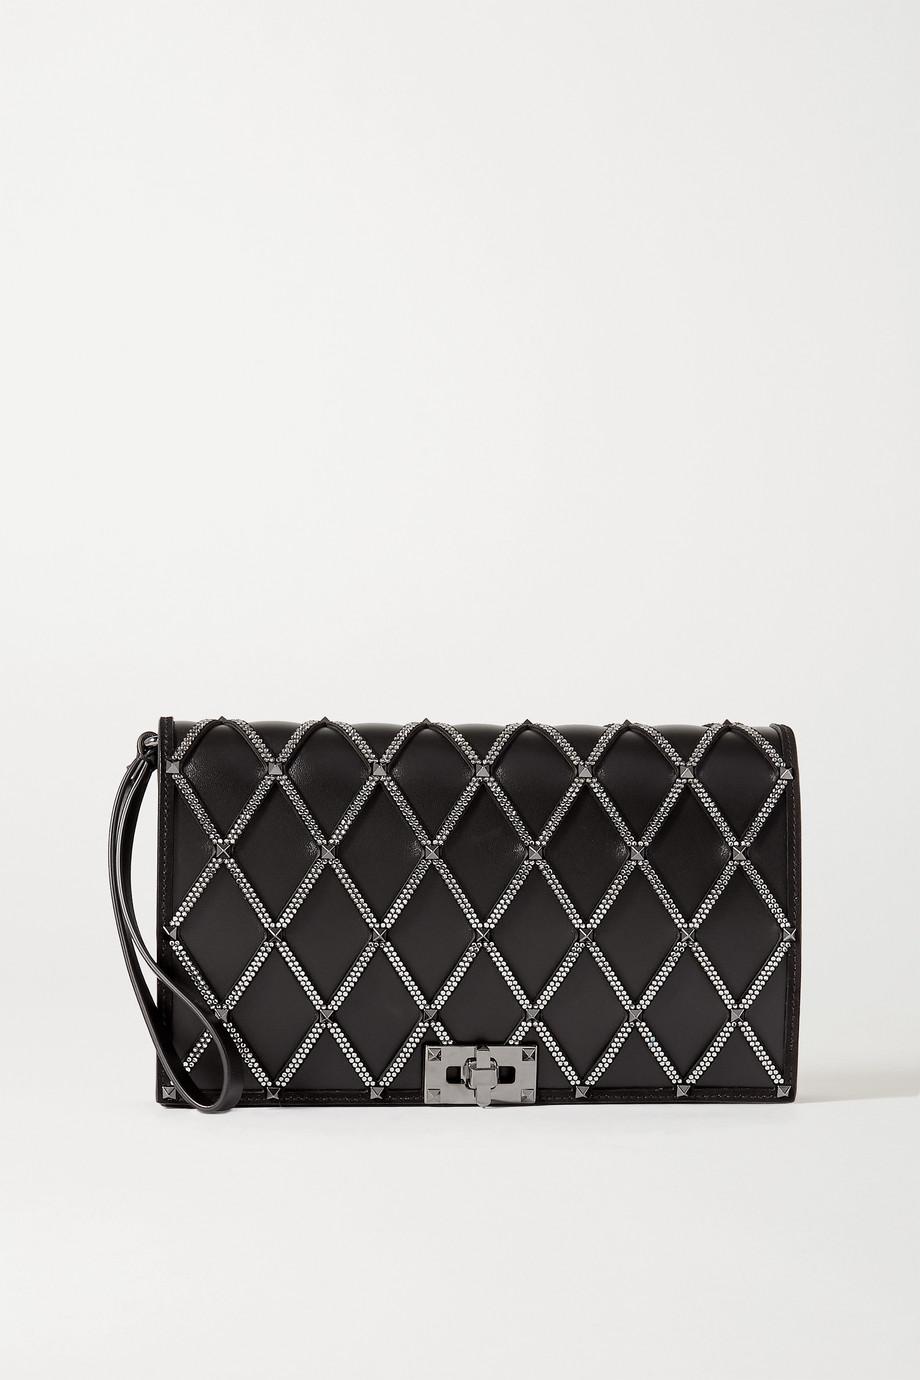 Valentino Valentino Garavani Beehive embellished leather clutch